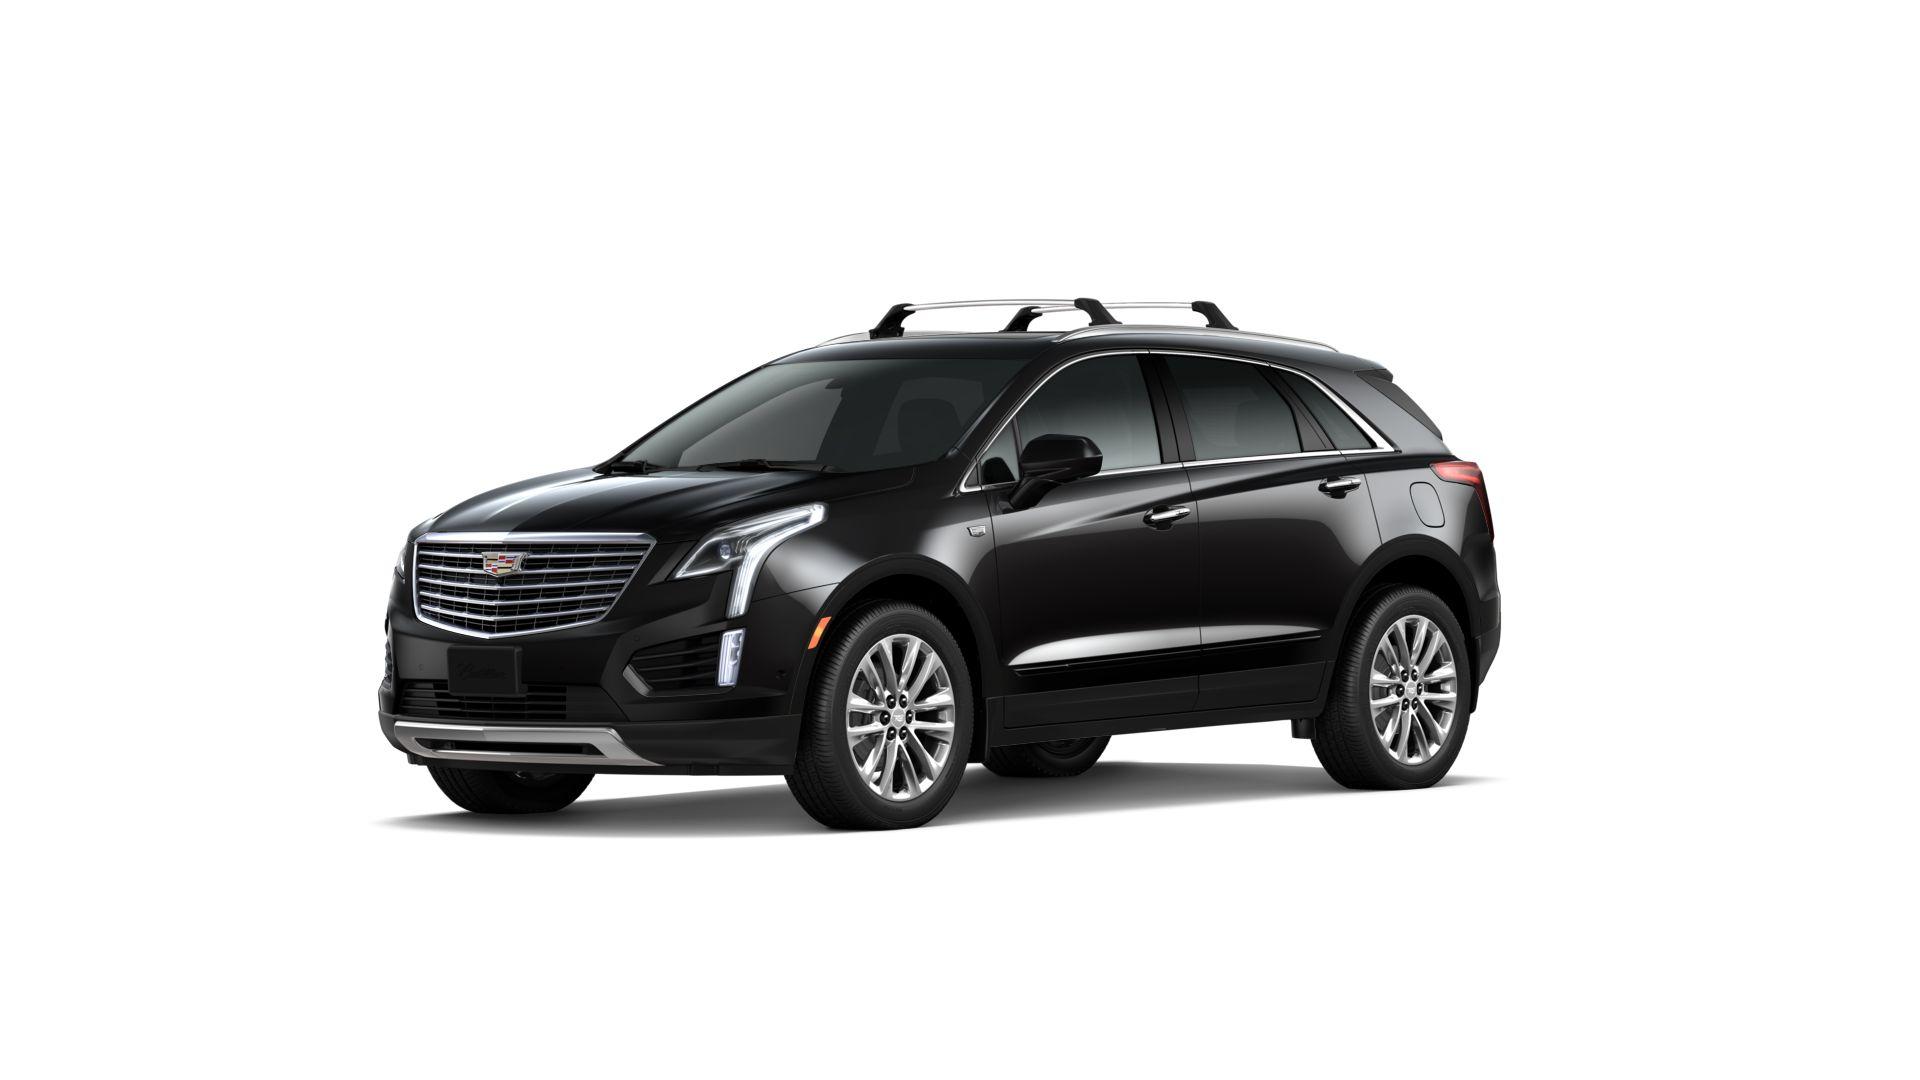 2019 Cadillac XT5 3.6L Platinum AWD